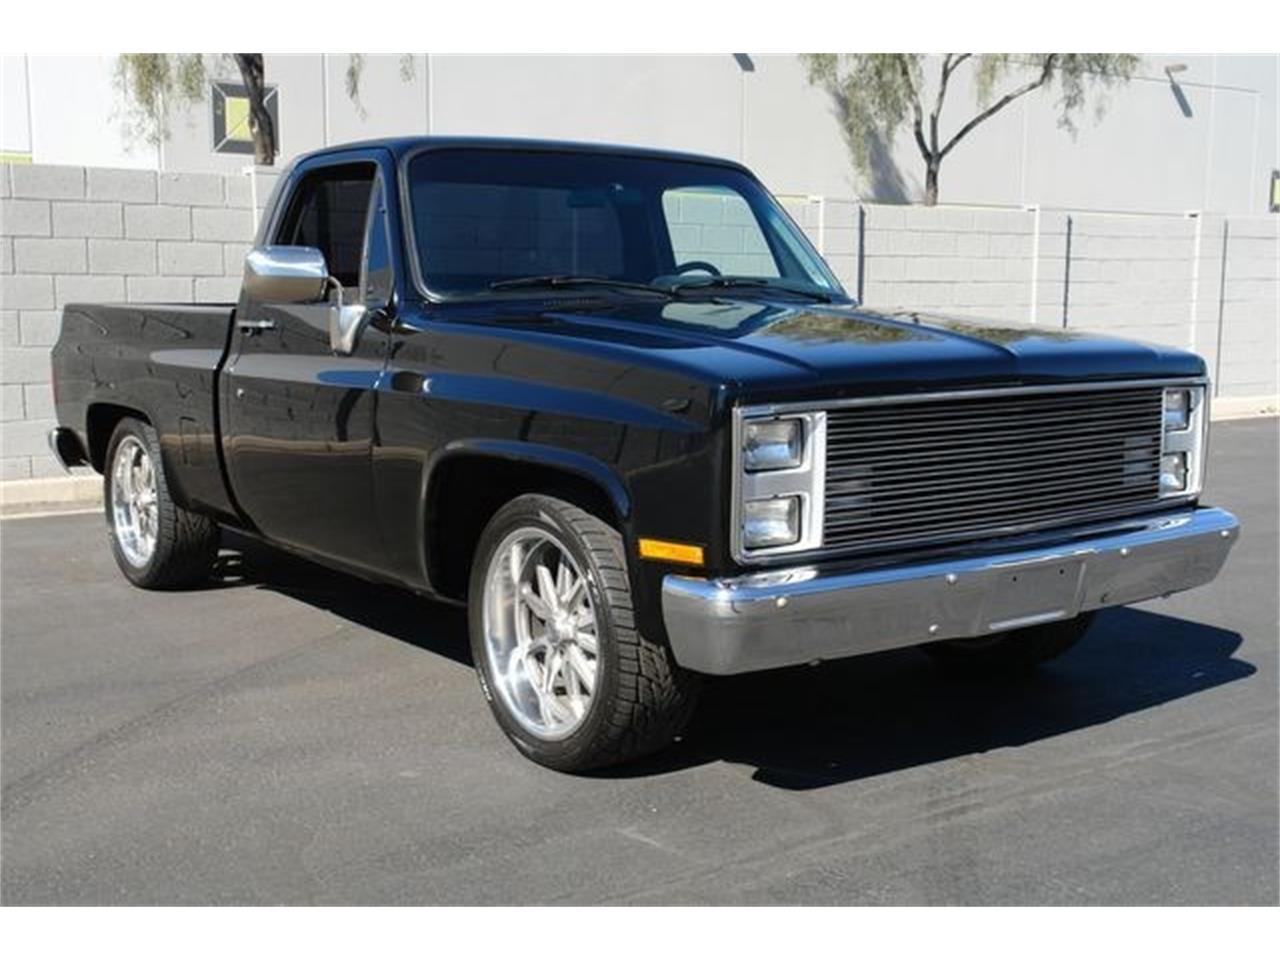 for sale at auction 1987 gmc 1 2 ton pickup in phoenix, arizona cars - phoenix, az at geebo